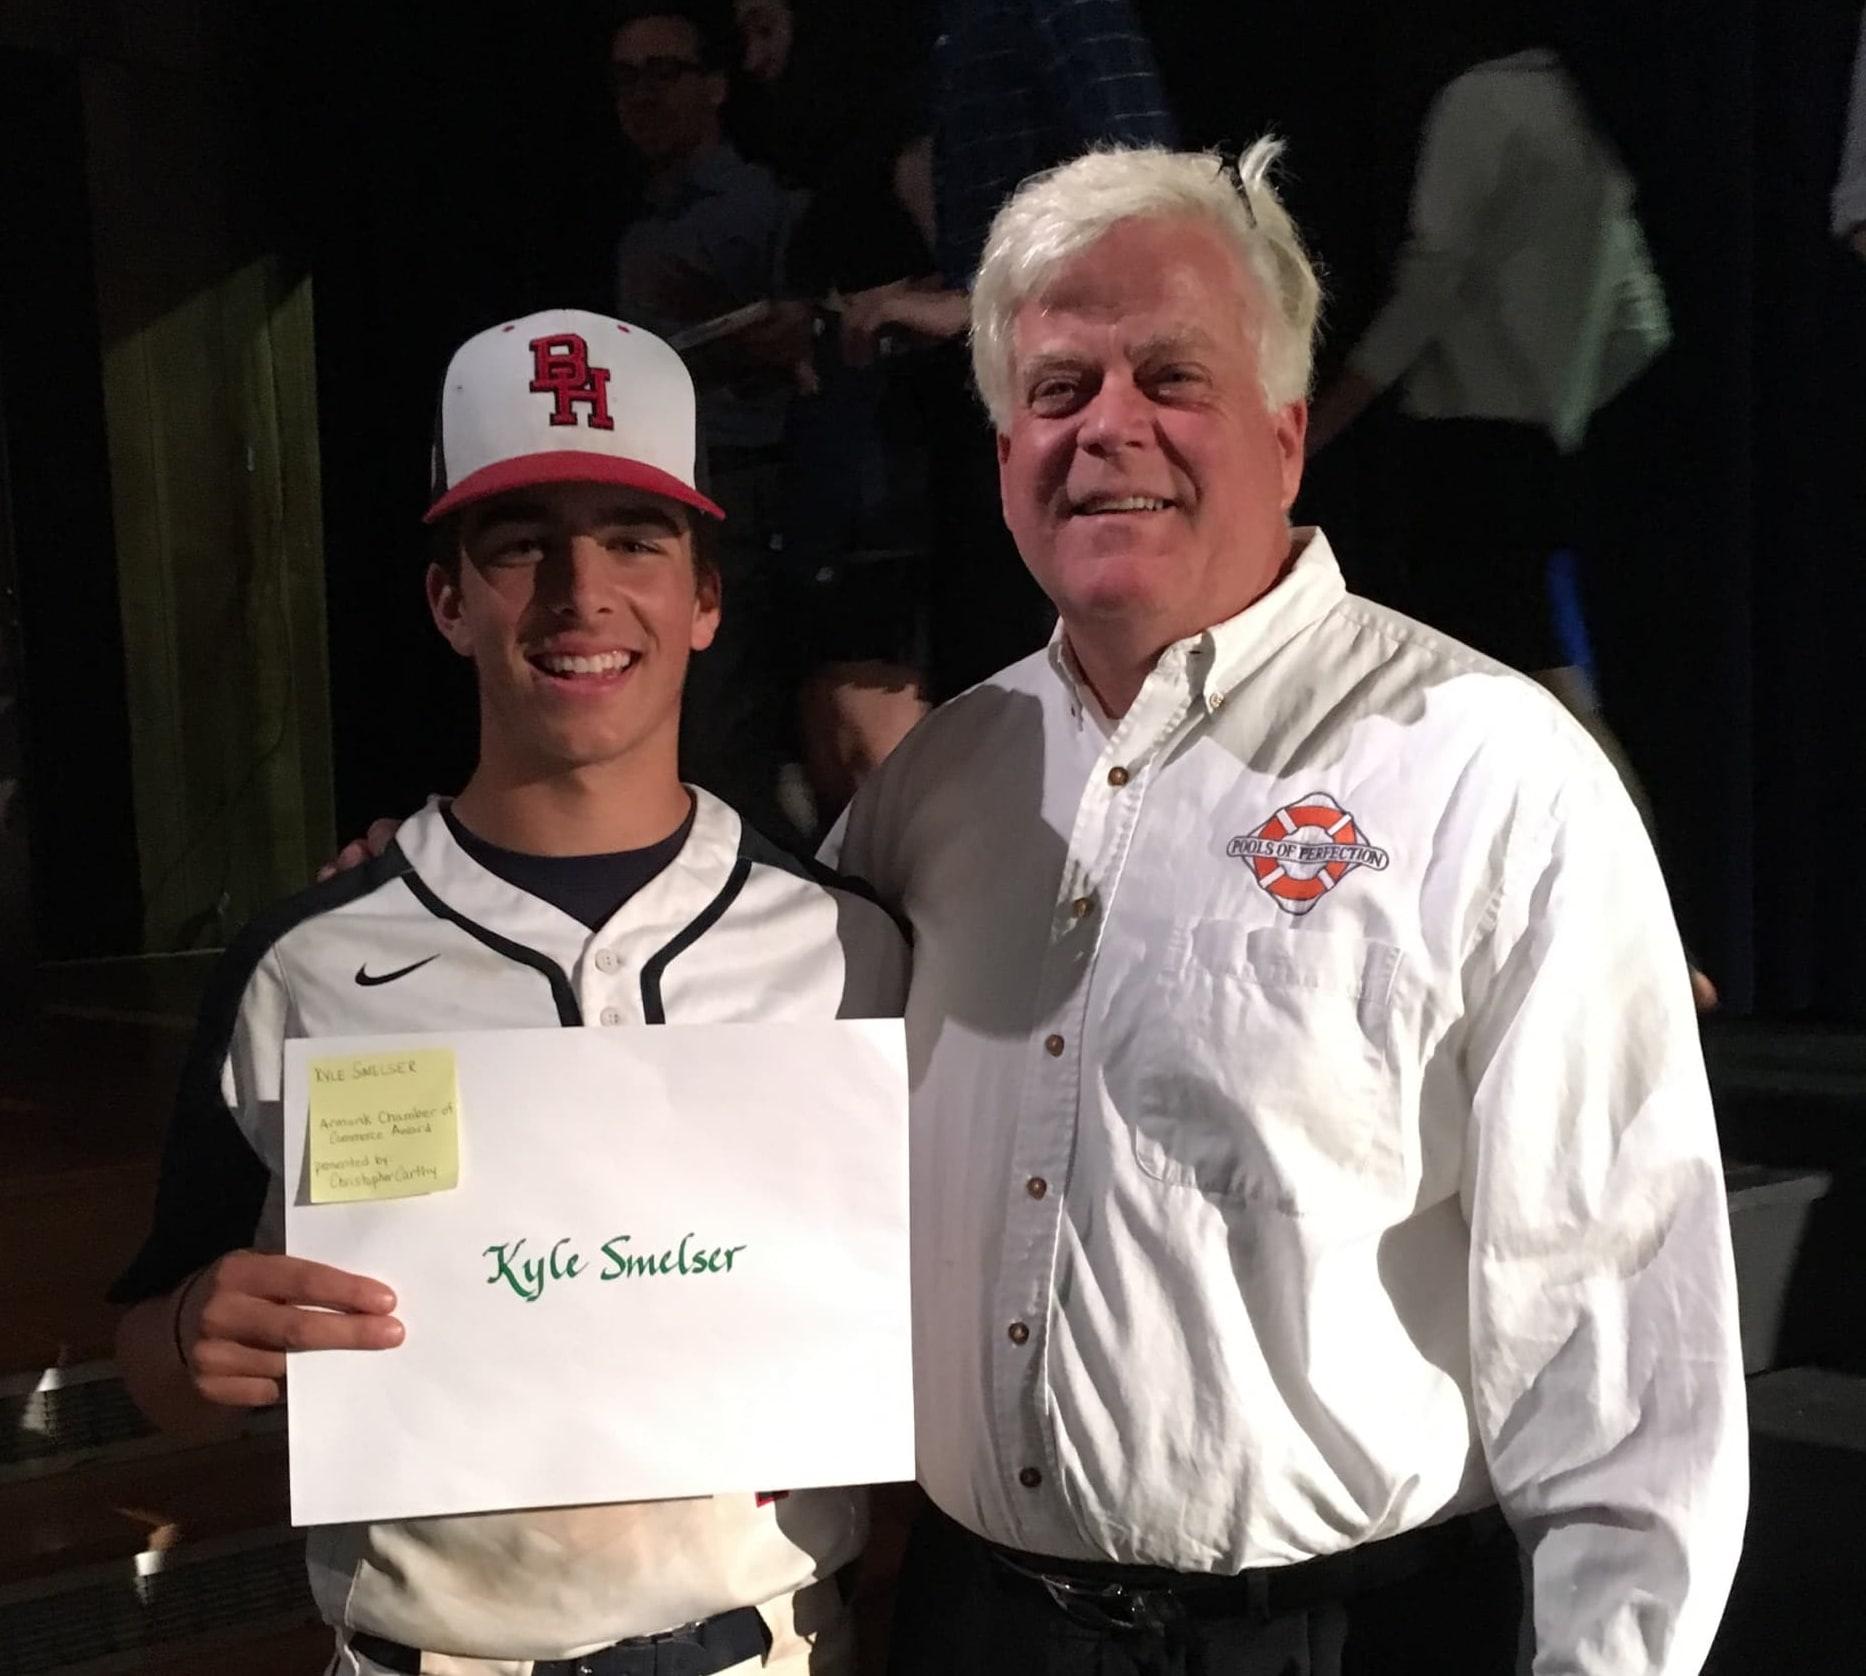 Kyle Scholarship Winner